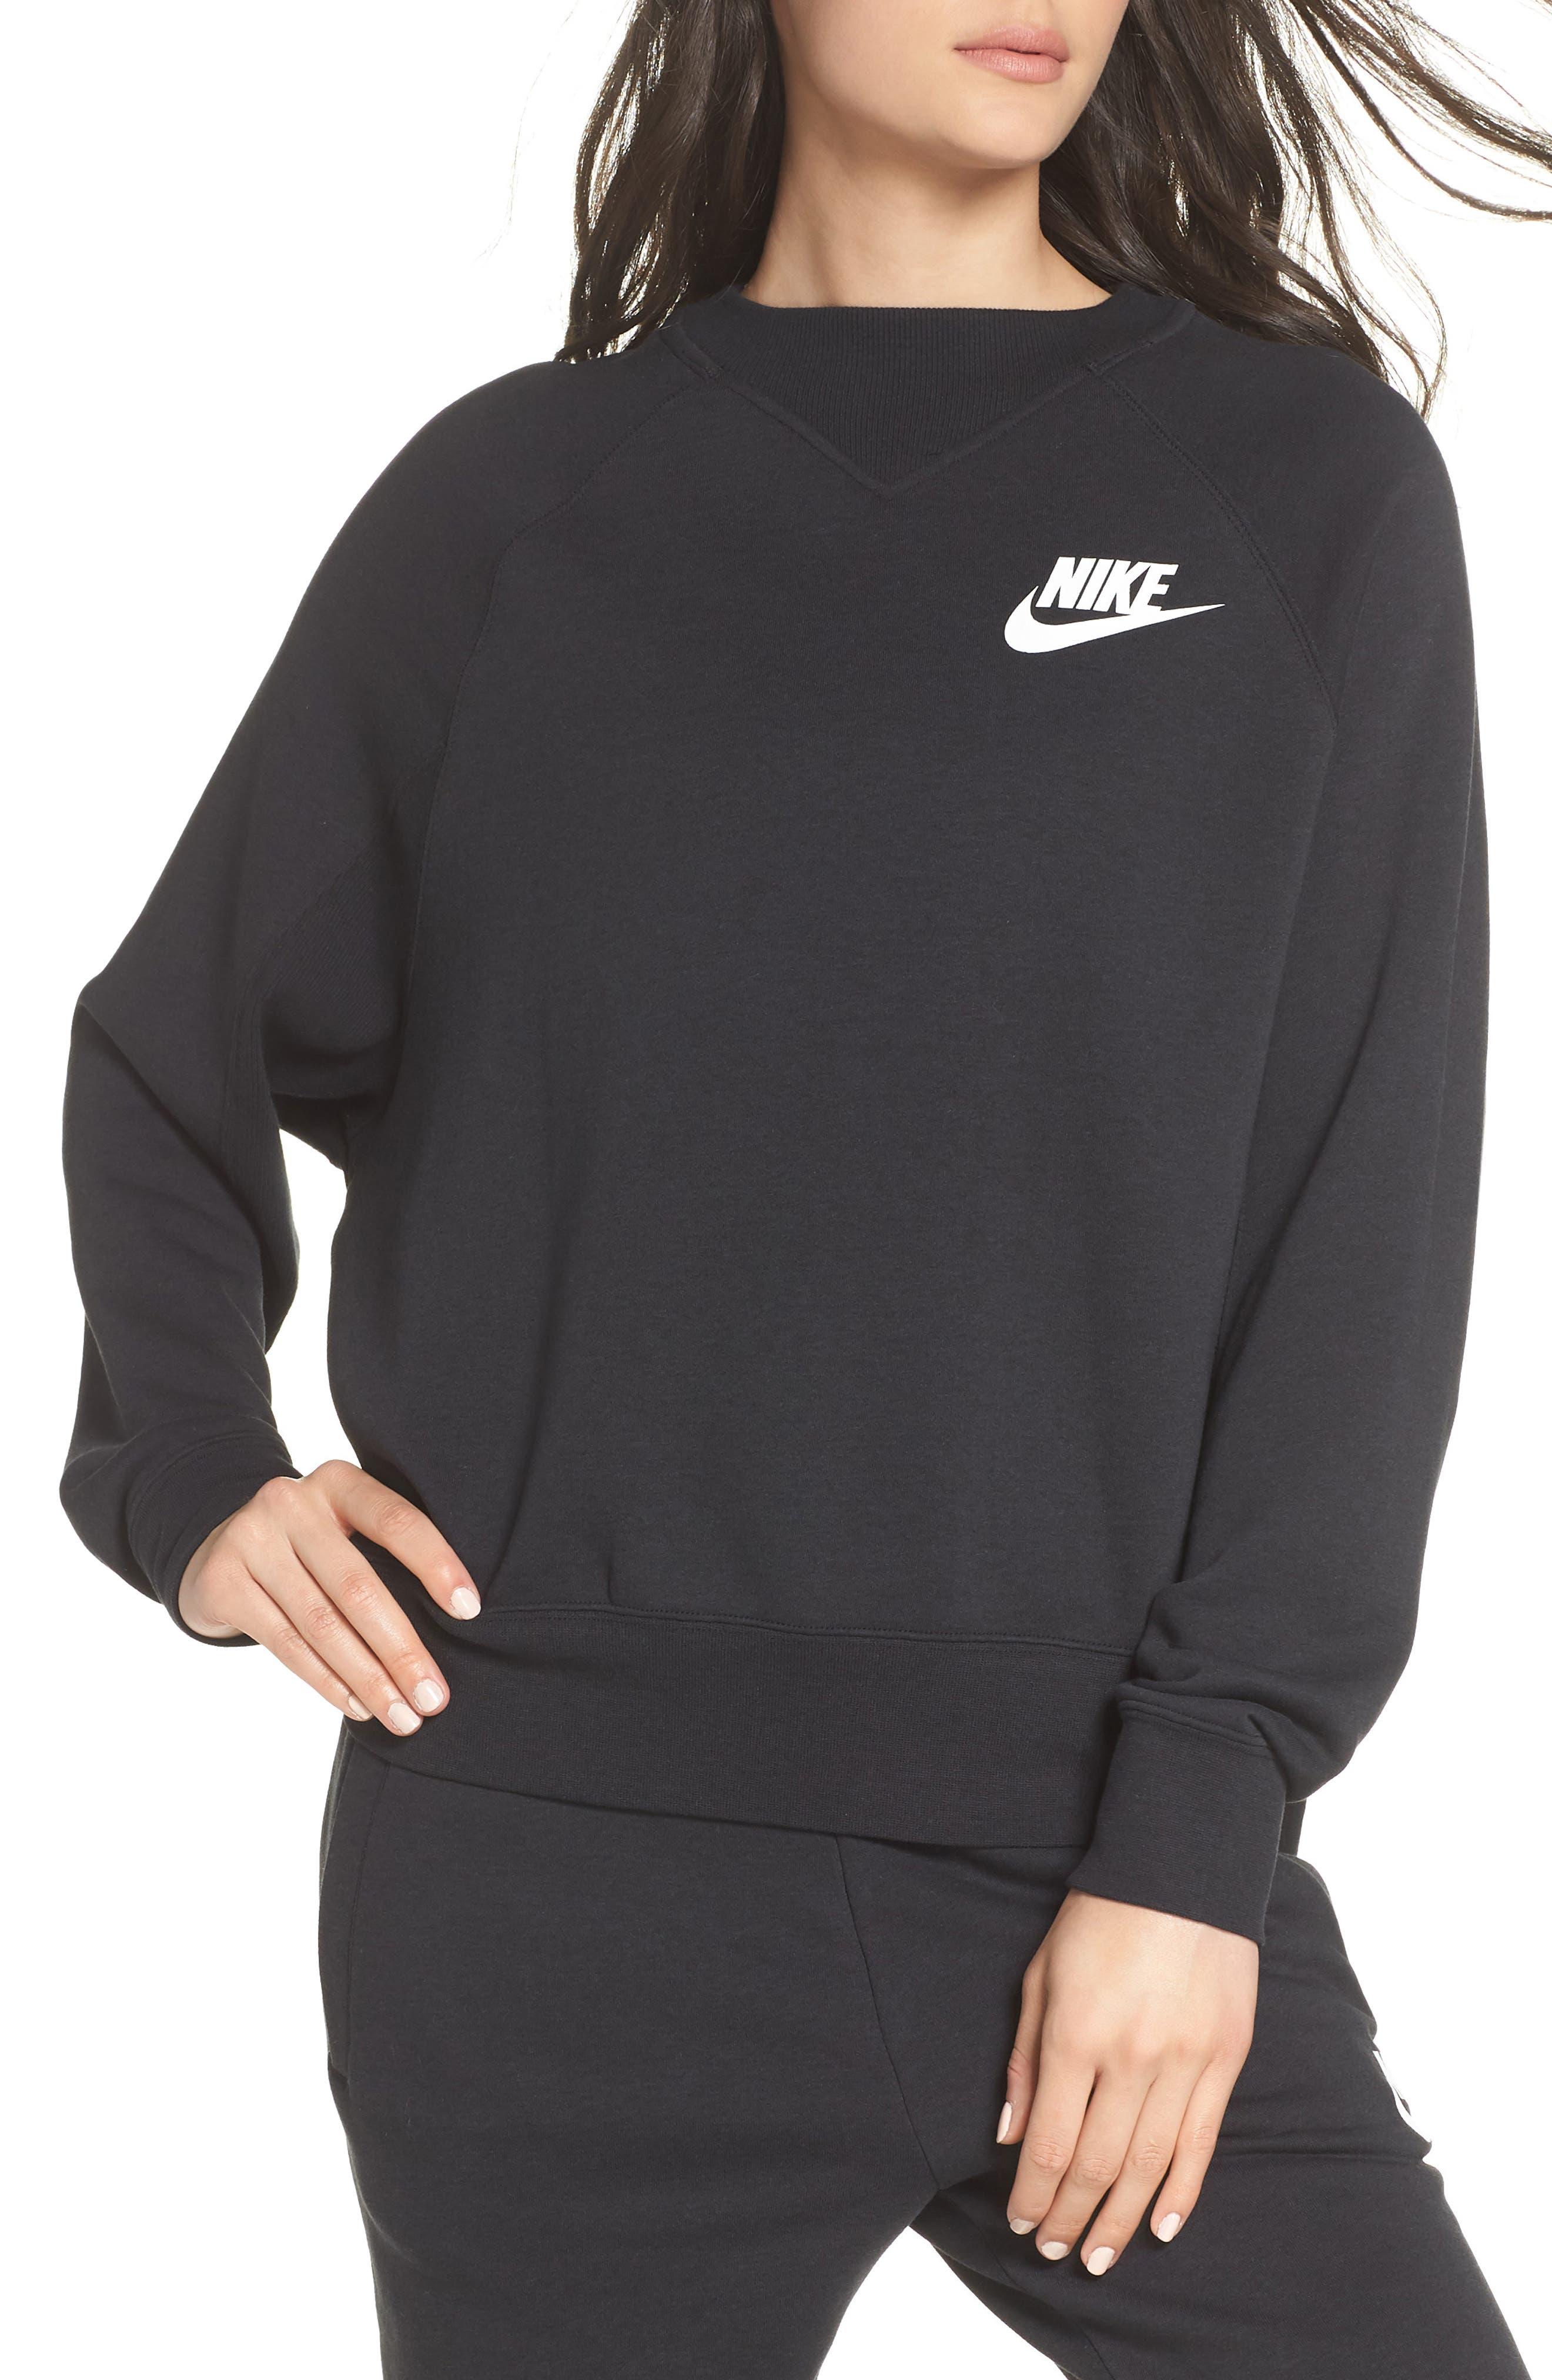 Sportswear Rally Sweatshirt,                         Main,                         color, Black/ White